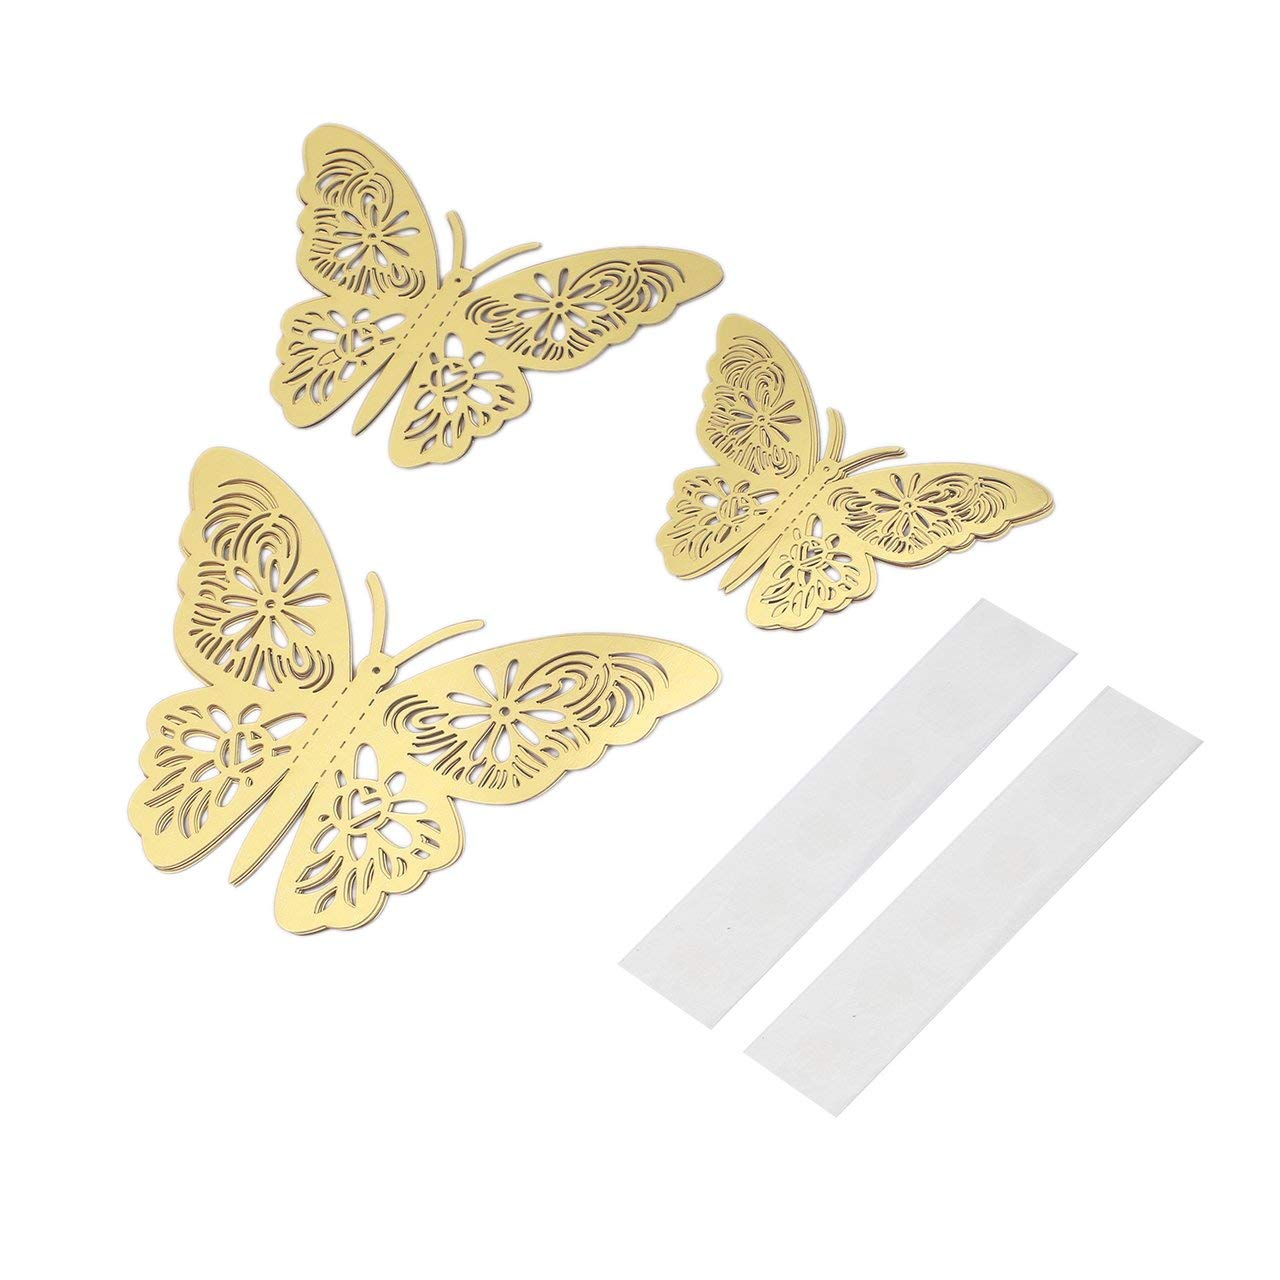 Romirofs 12pcs G 005 Metallic Sense 3D Butterfly Stickers Hollow DIY Home Decal Kids Rooms Wall Decor Party Wedding Decoration